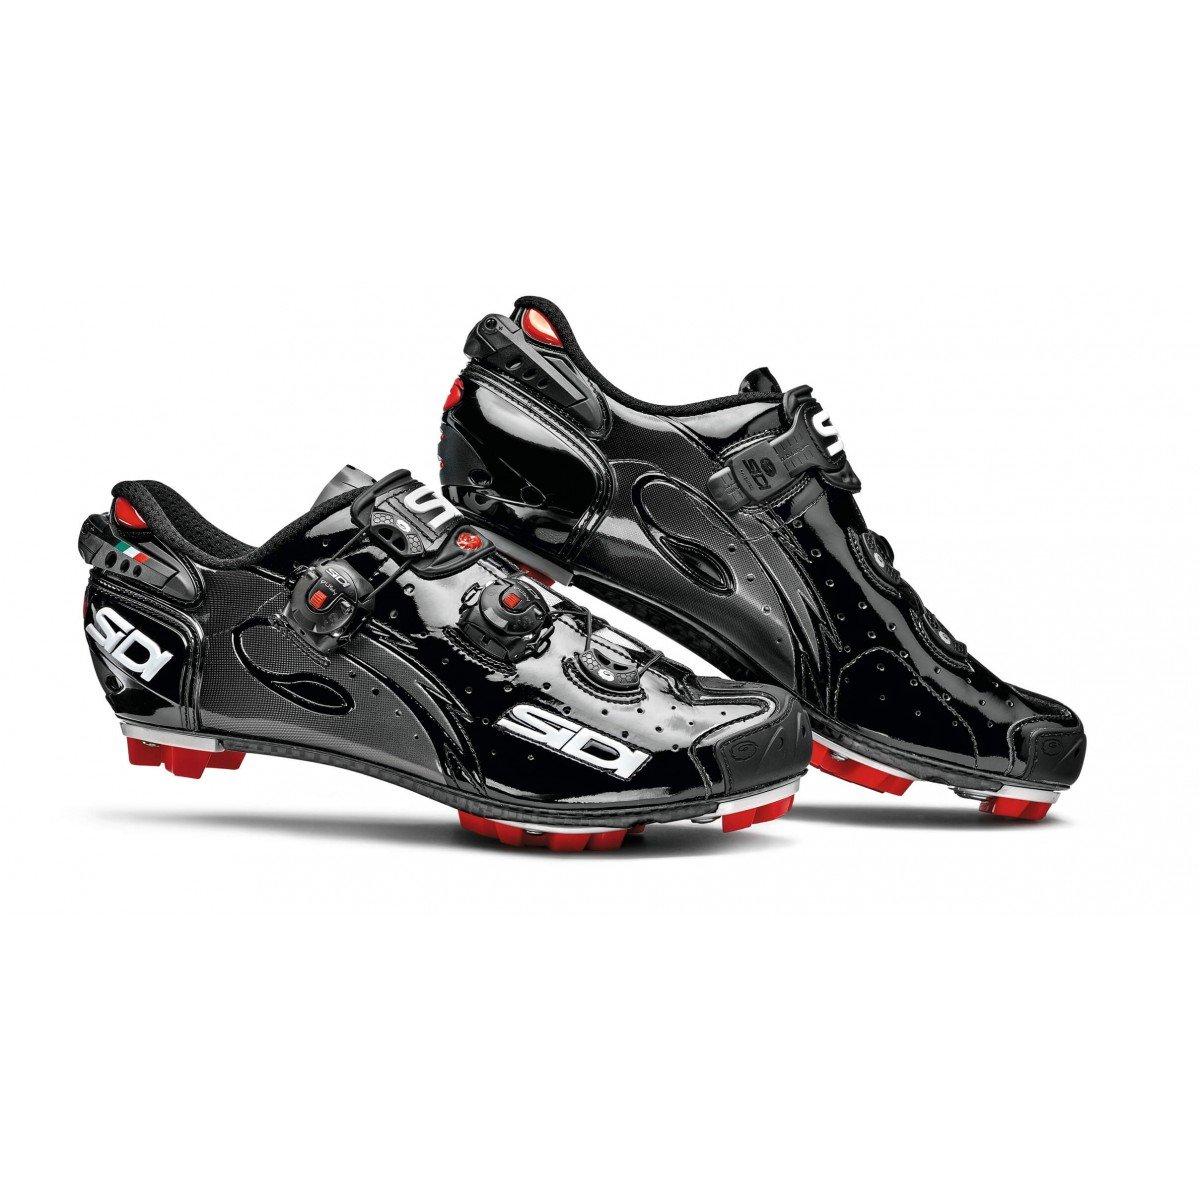 Schuhe MTB Drako 2016 Gr. 48, Schwarzer Lack